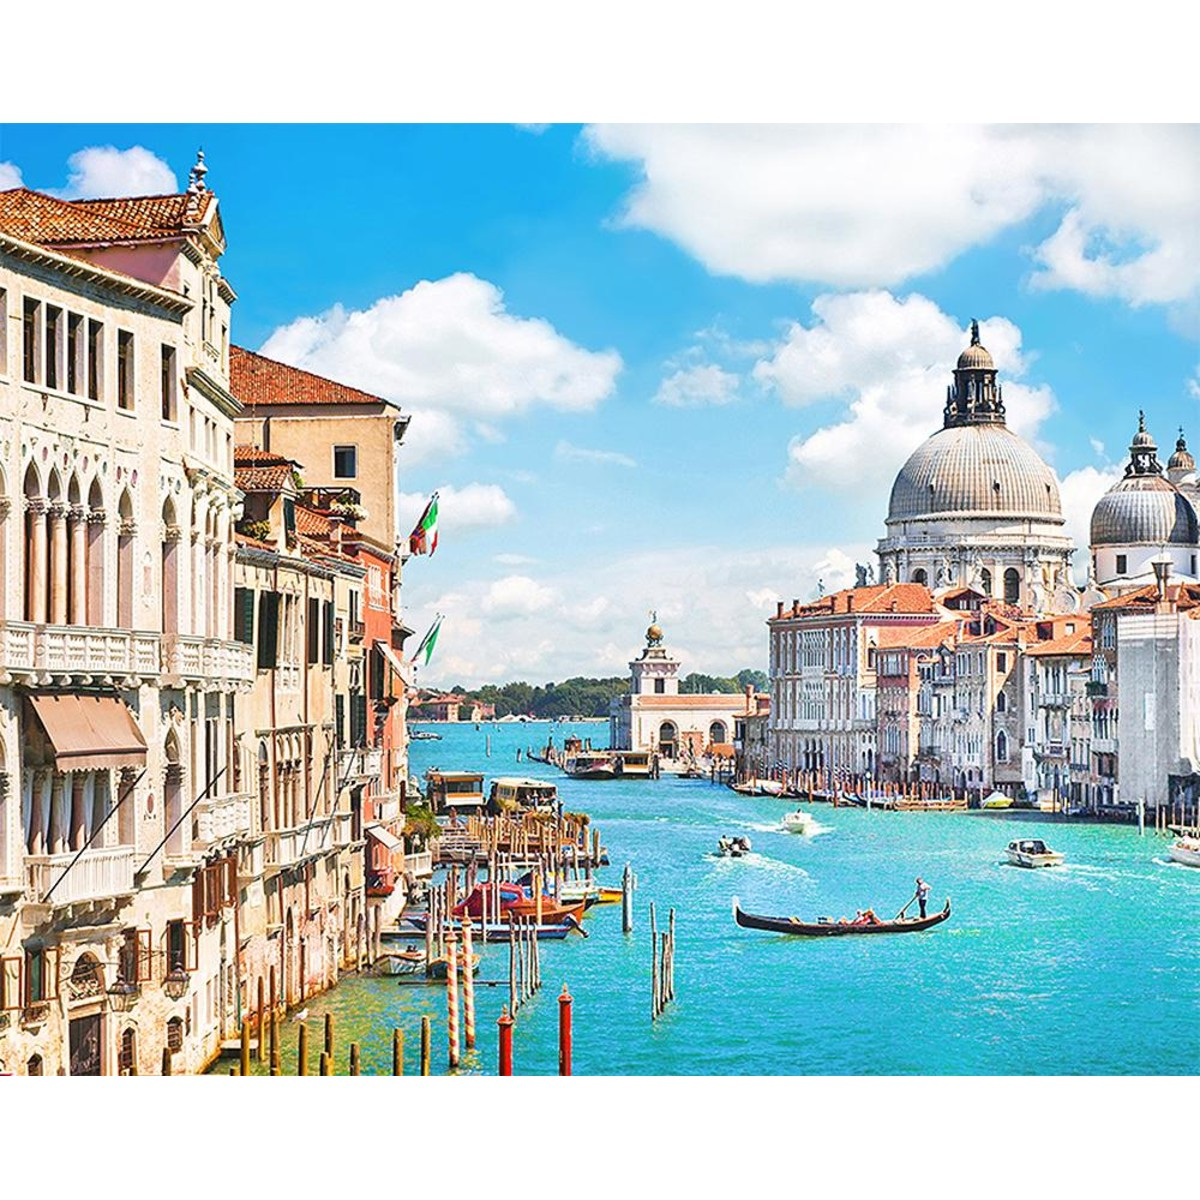 Фотообои Divino Decor Венеция A-047 300х238 см